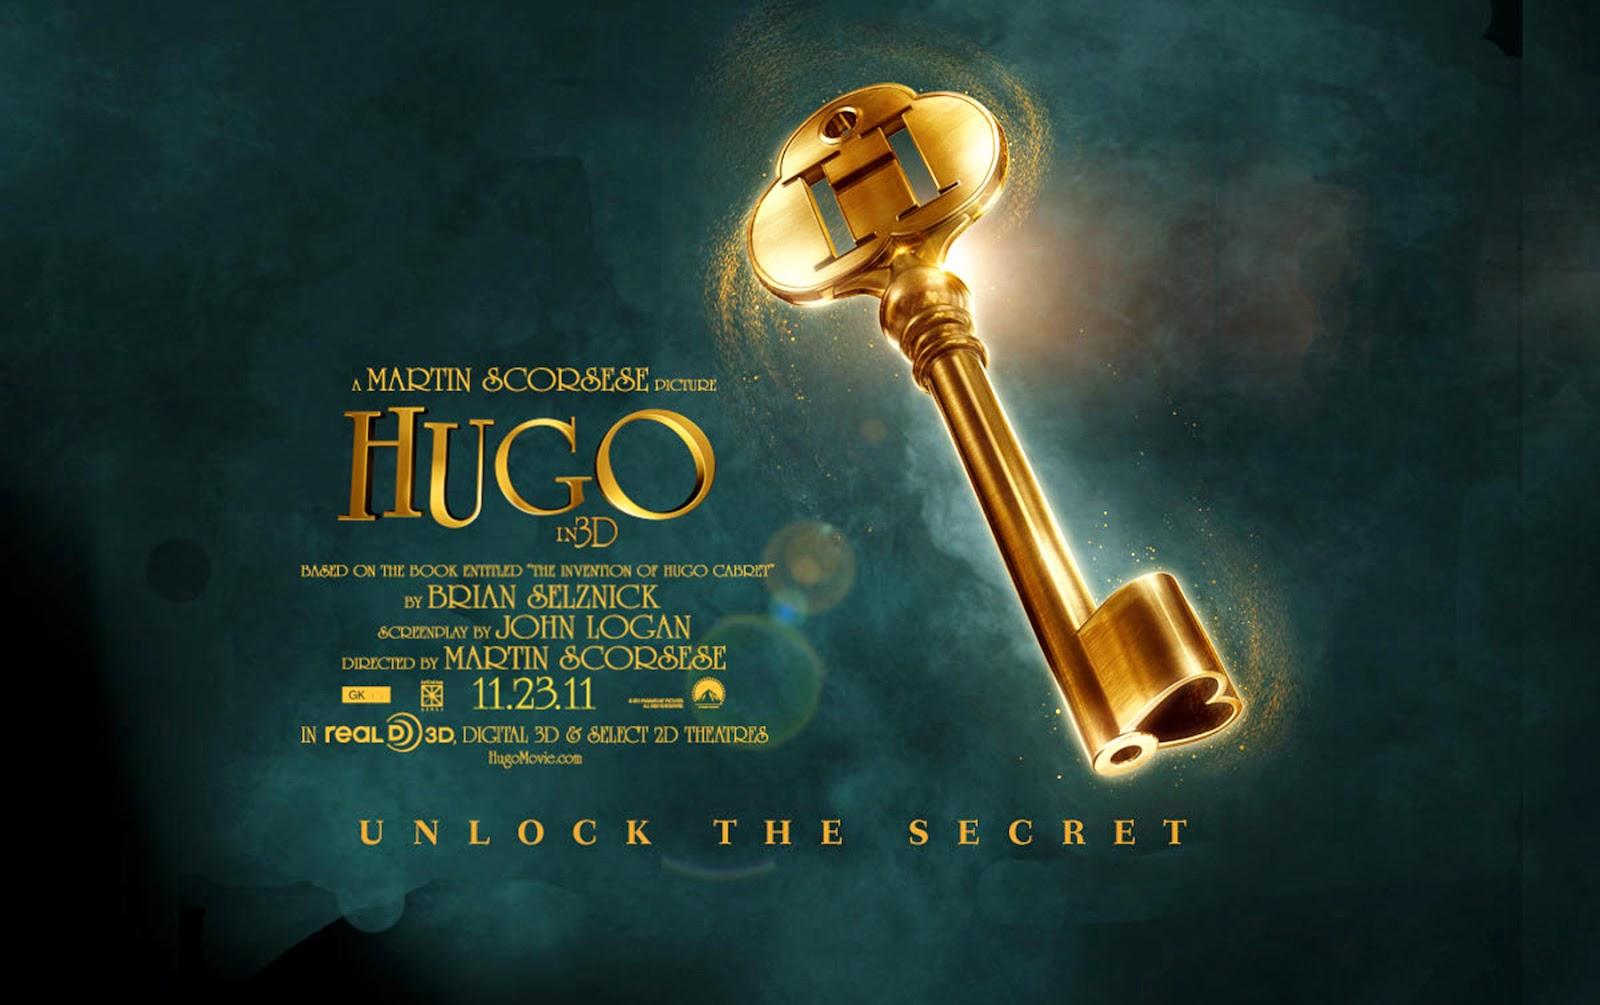 Film Studies Ii Hugo 2011 Film Review